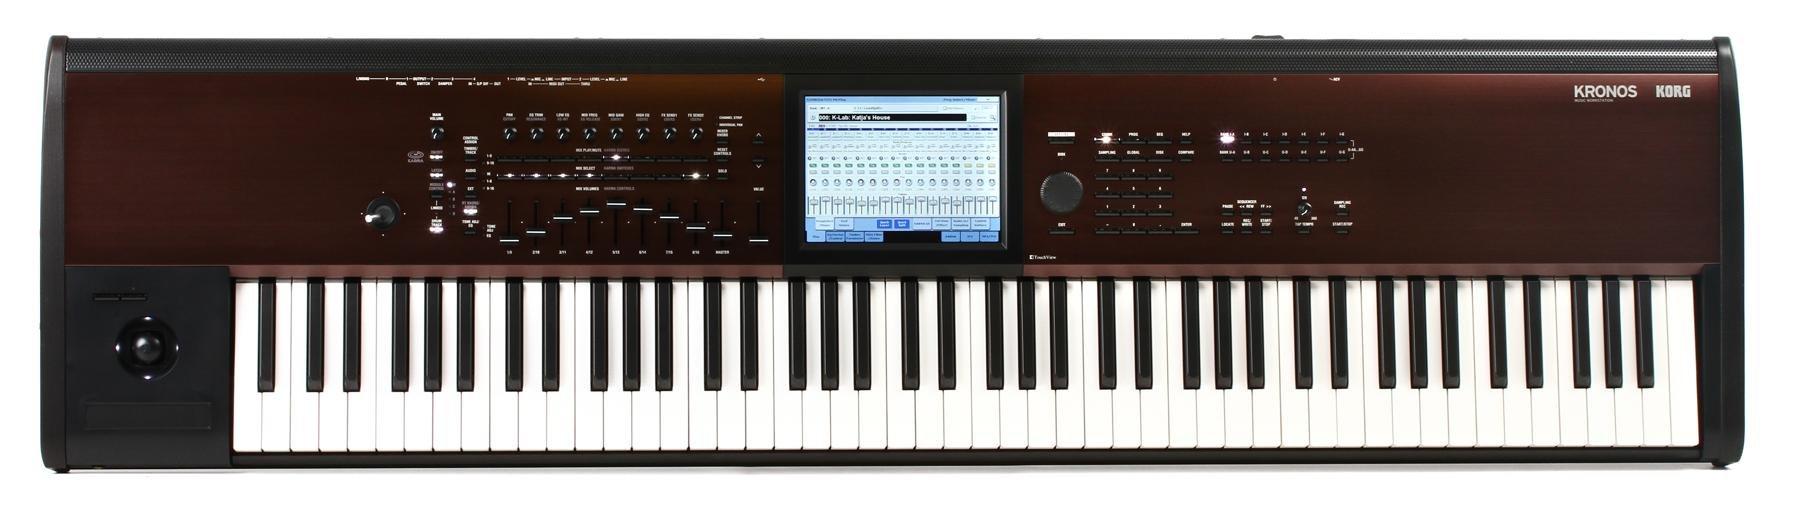 Korg Kronos LS 88-key Synthesizer Workstation | Sweetwater